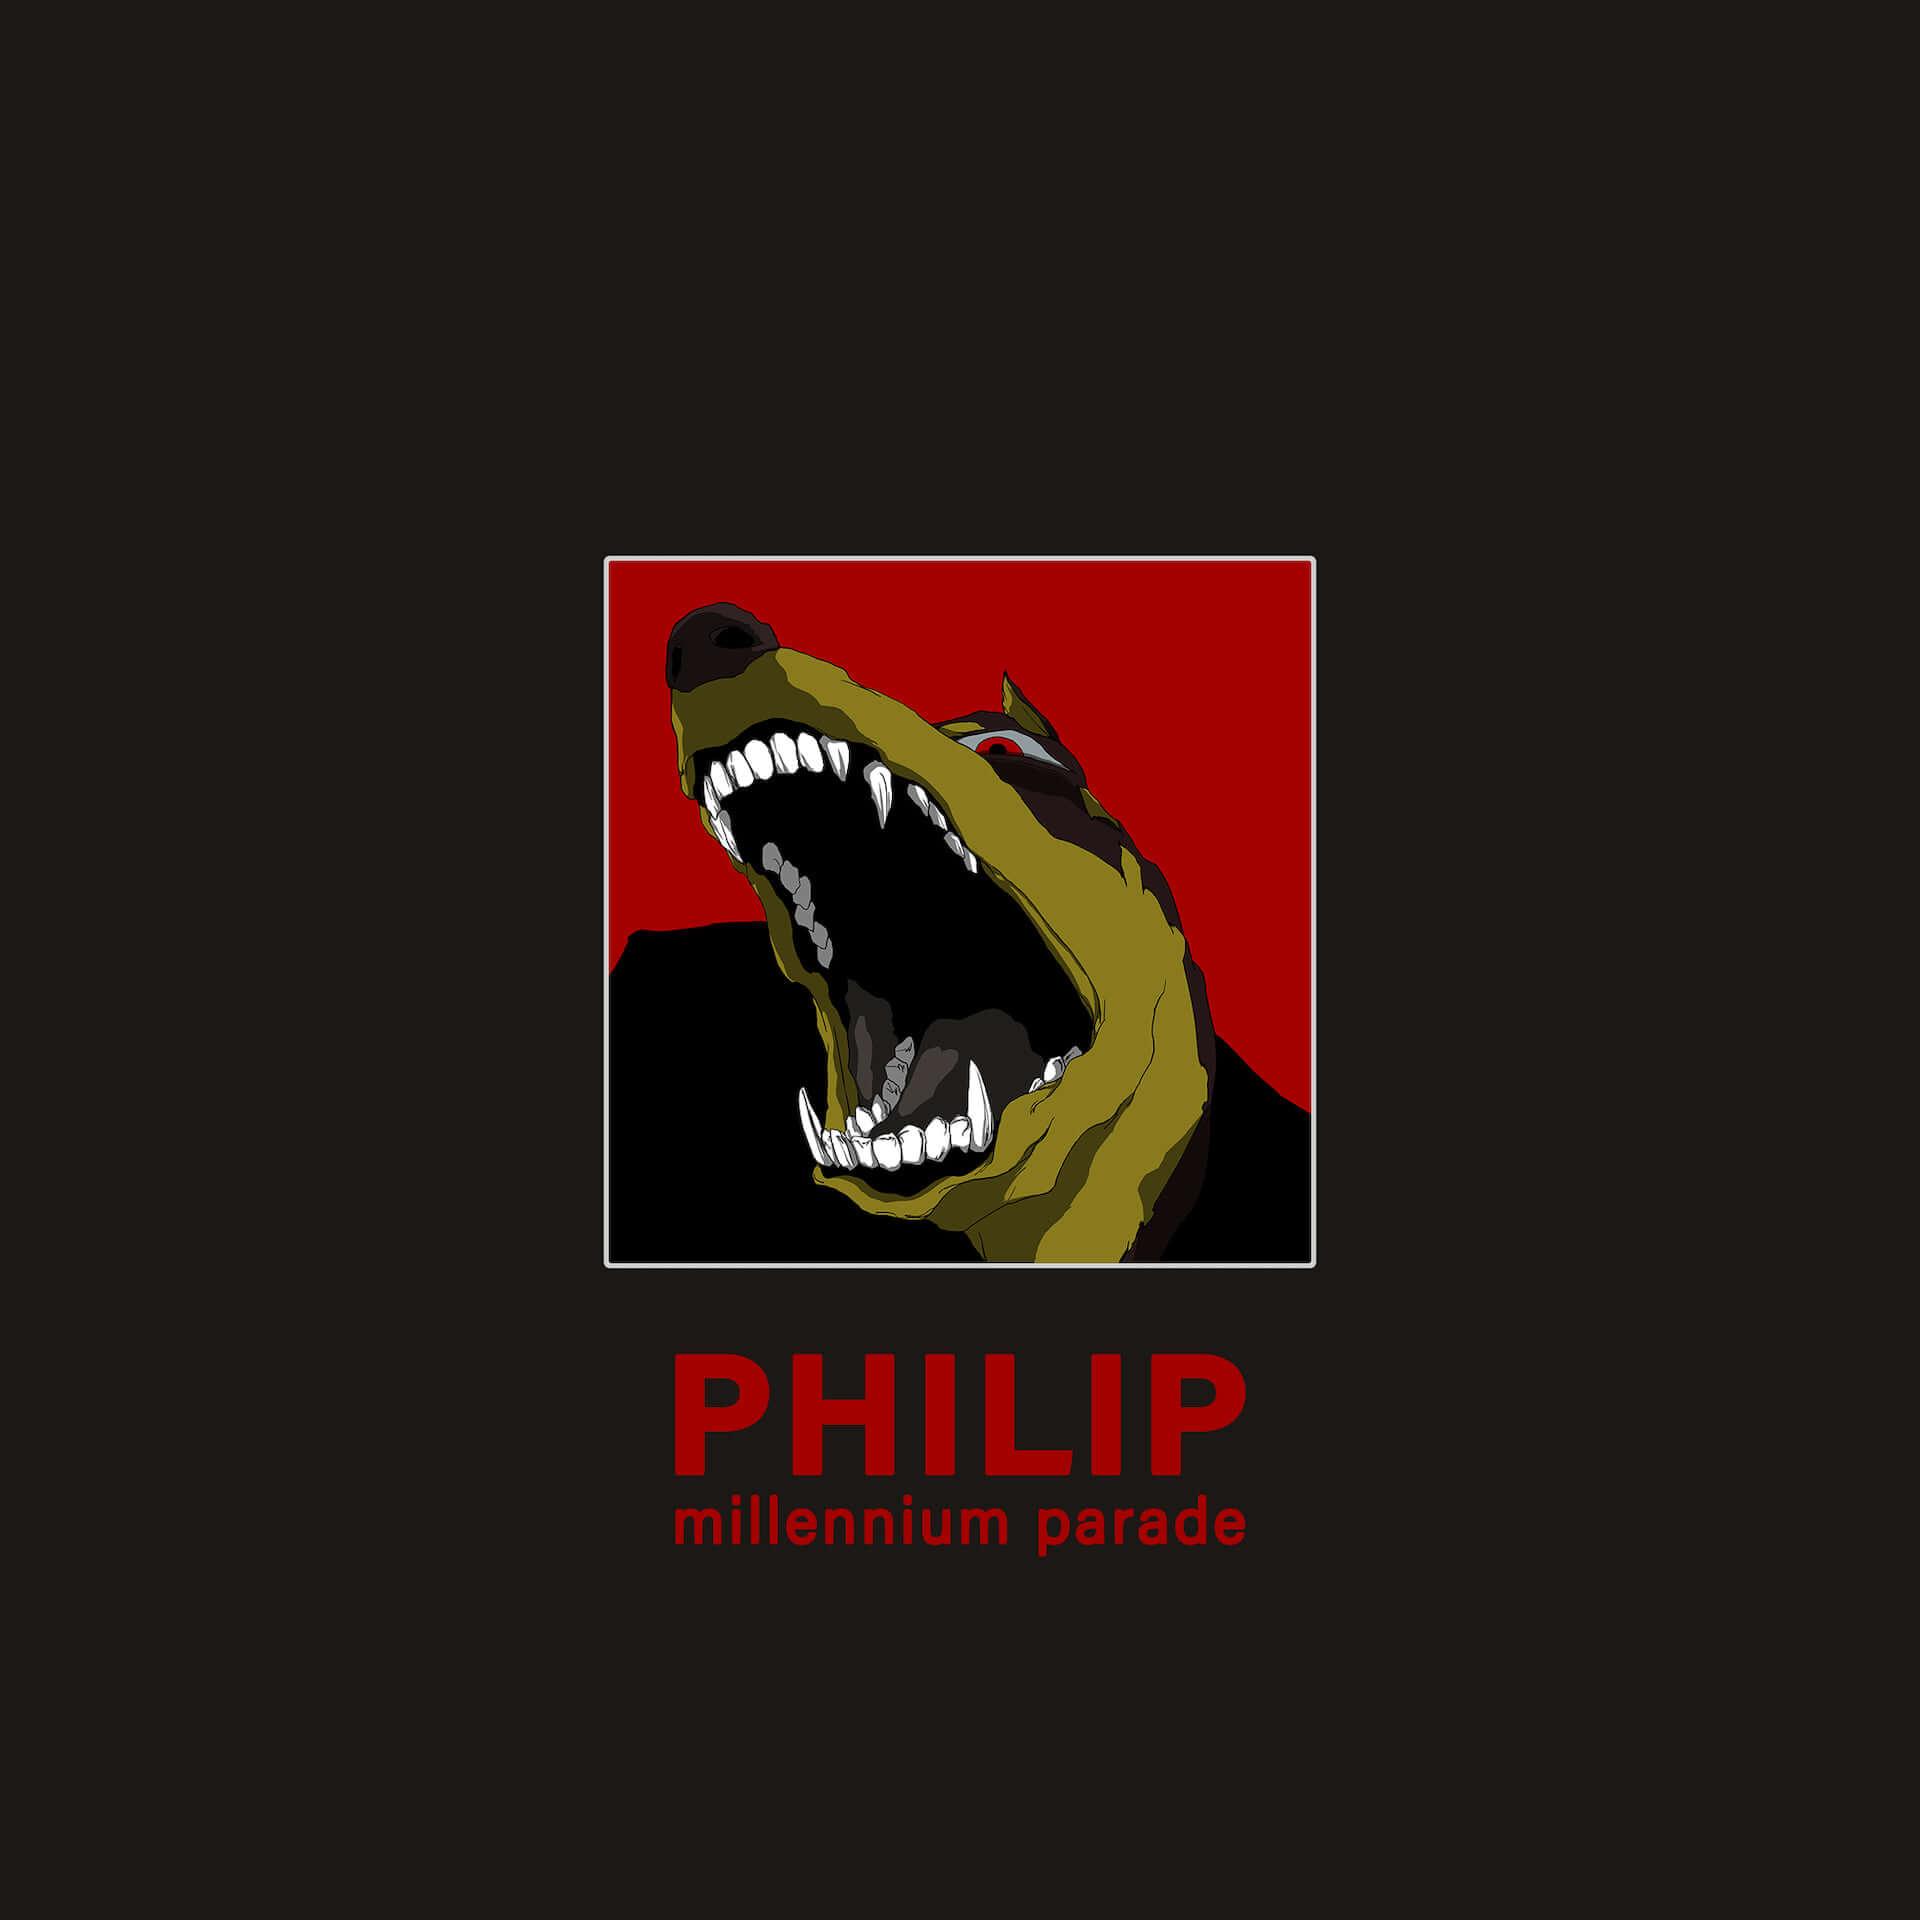 "millennium paradeの新曲""Philip""がリリース&MV公開!山田遼志と佐々木集によるデザインの『Philip Anniversary BOX』も発売決定 music201002_millenniumparade_3-1920x1920"